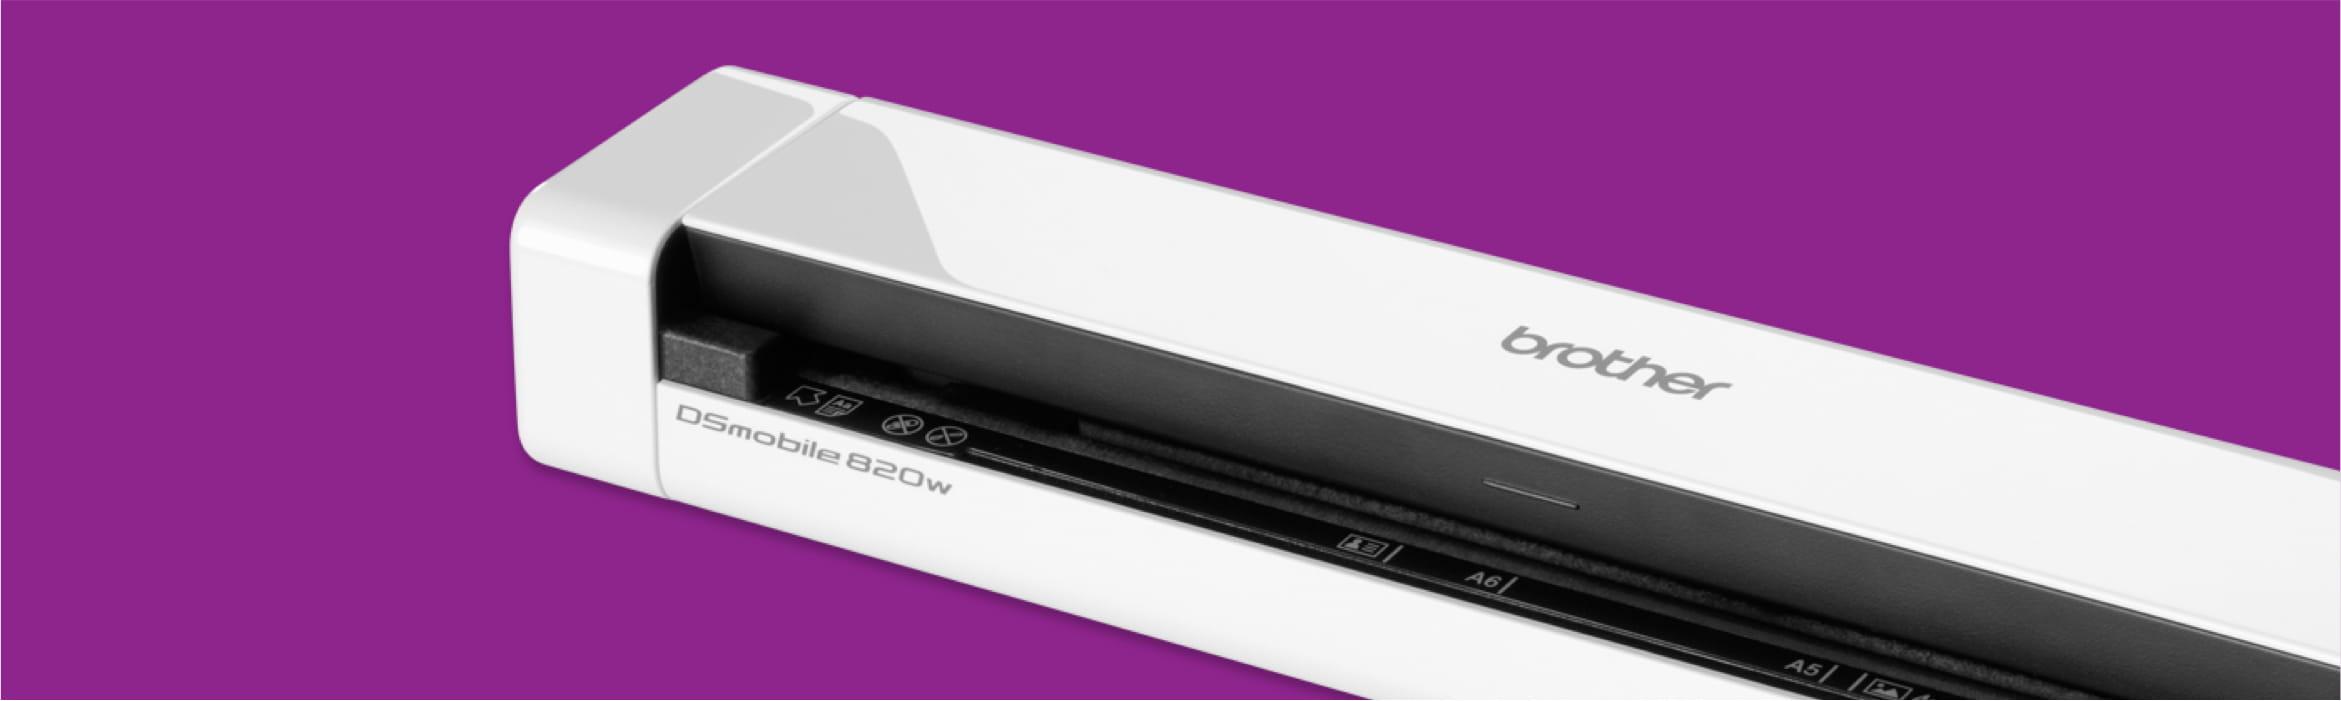 scanner on purple background